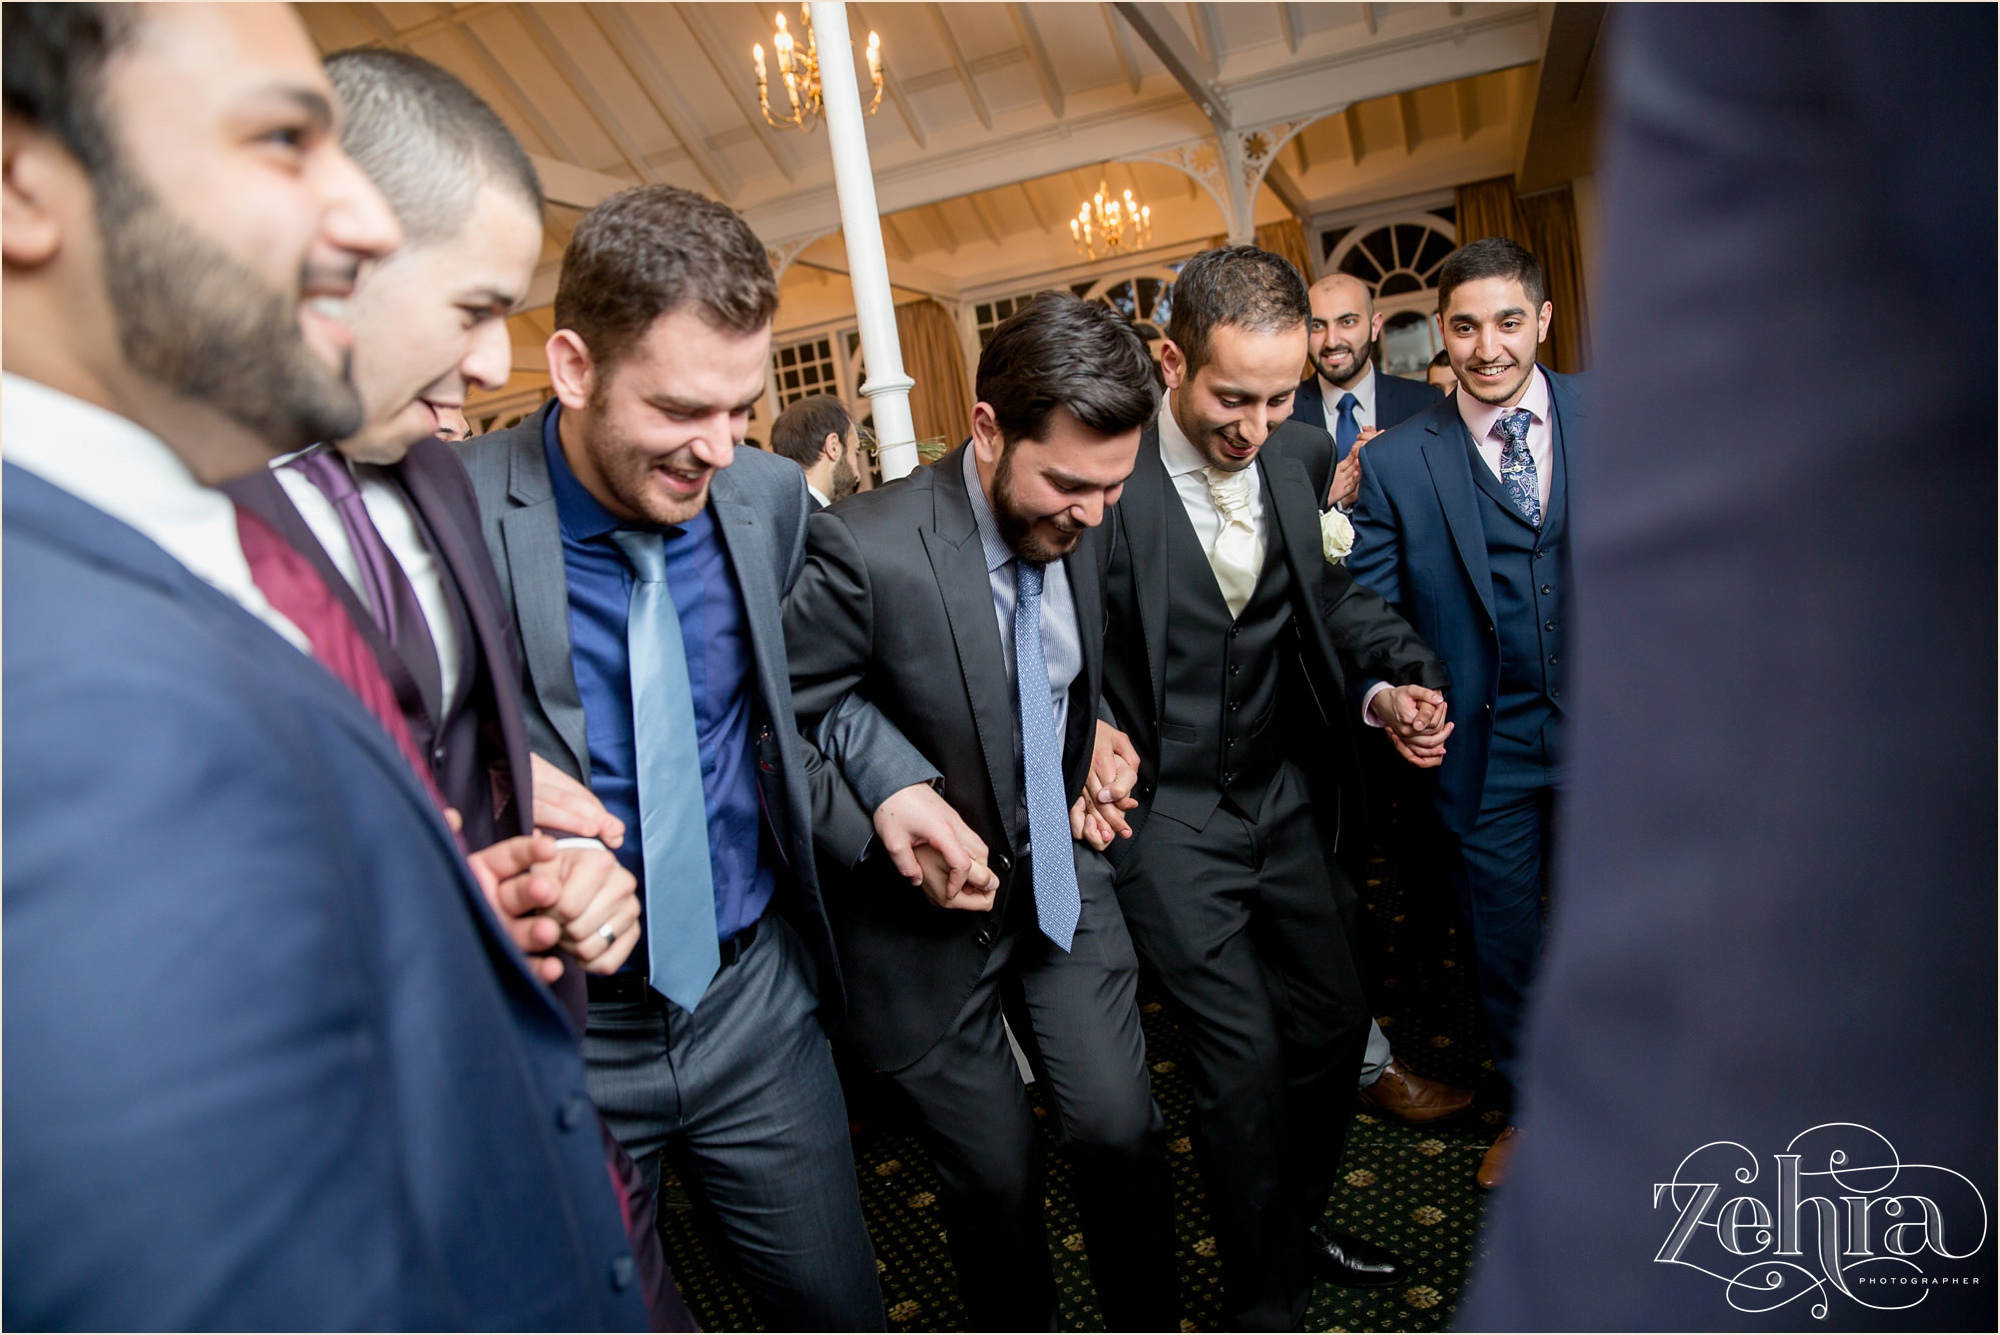 jasira manchester wedding photographer_0134.jpg